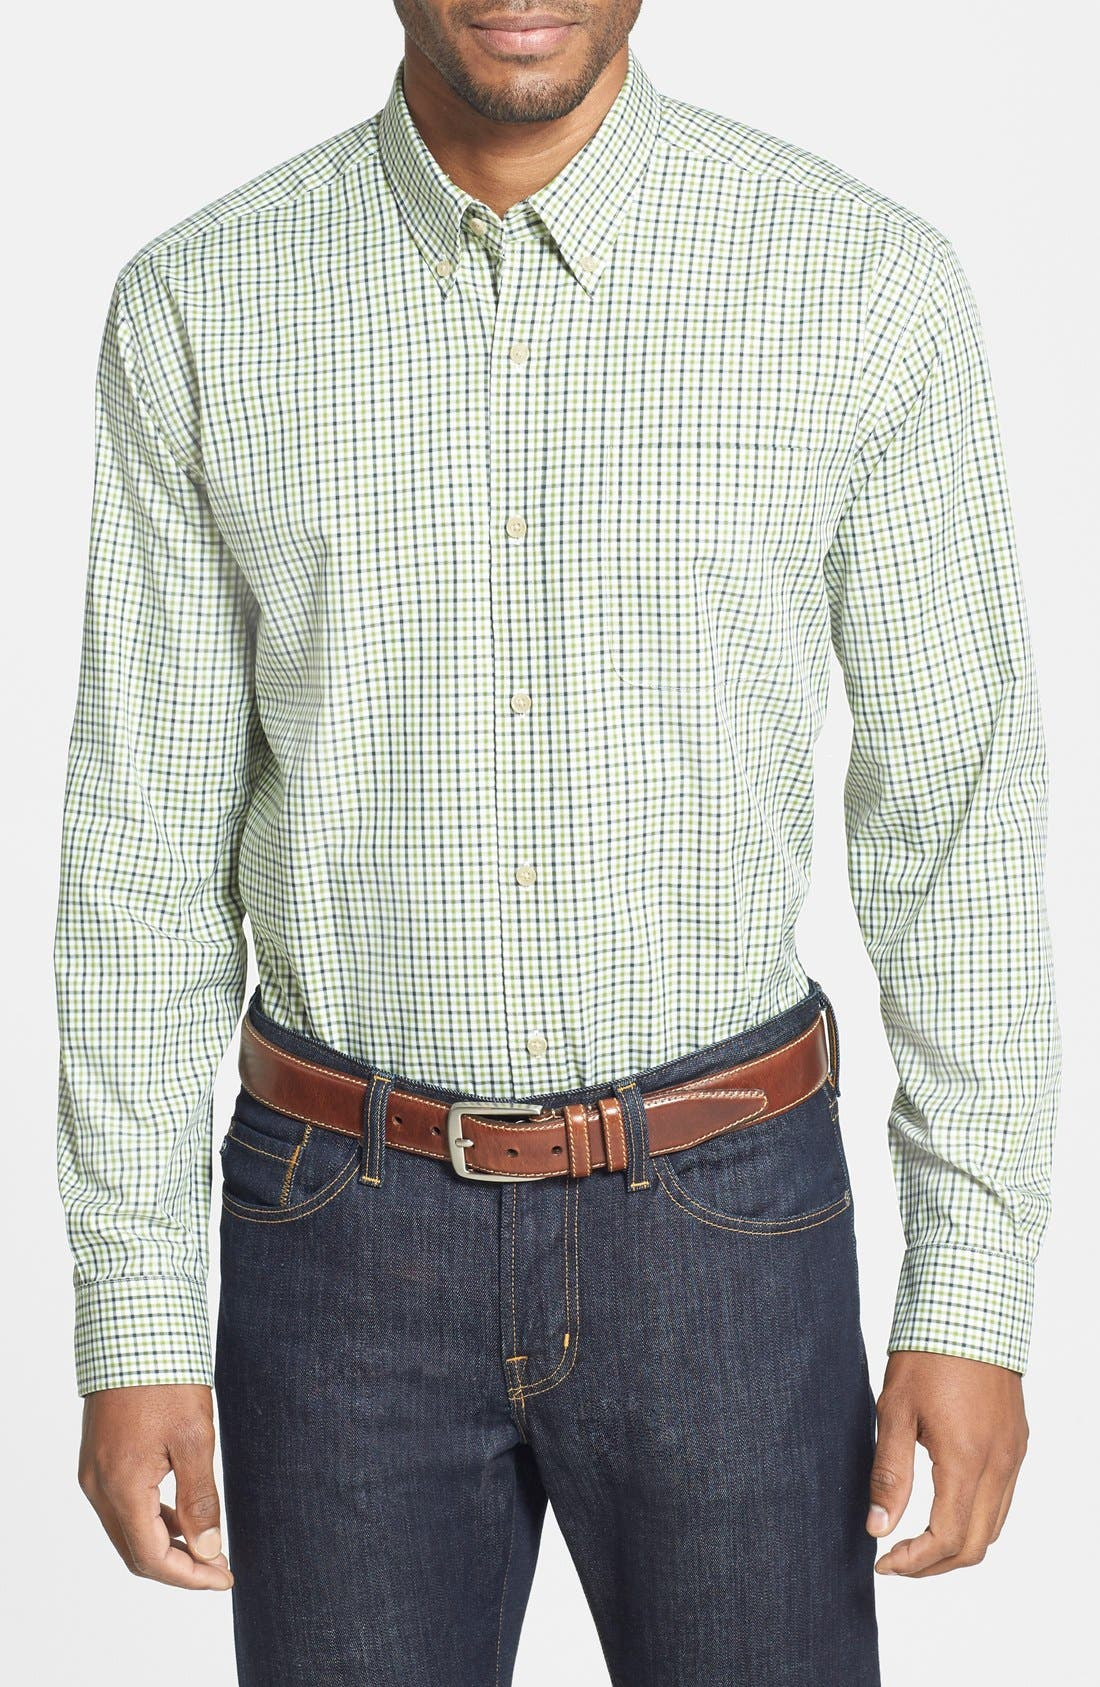 Main Image - Cutter & Buck 'Isley' Classic Fit Check Twill Sport Shirt (Big & Tall)